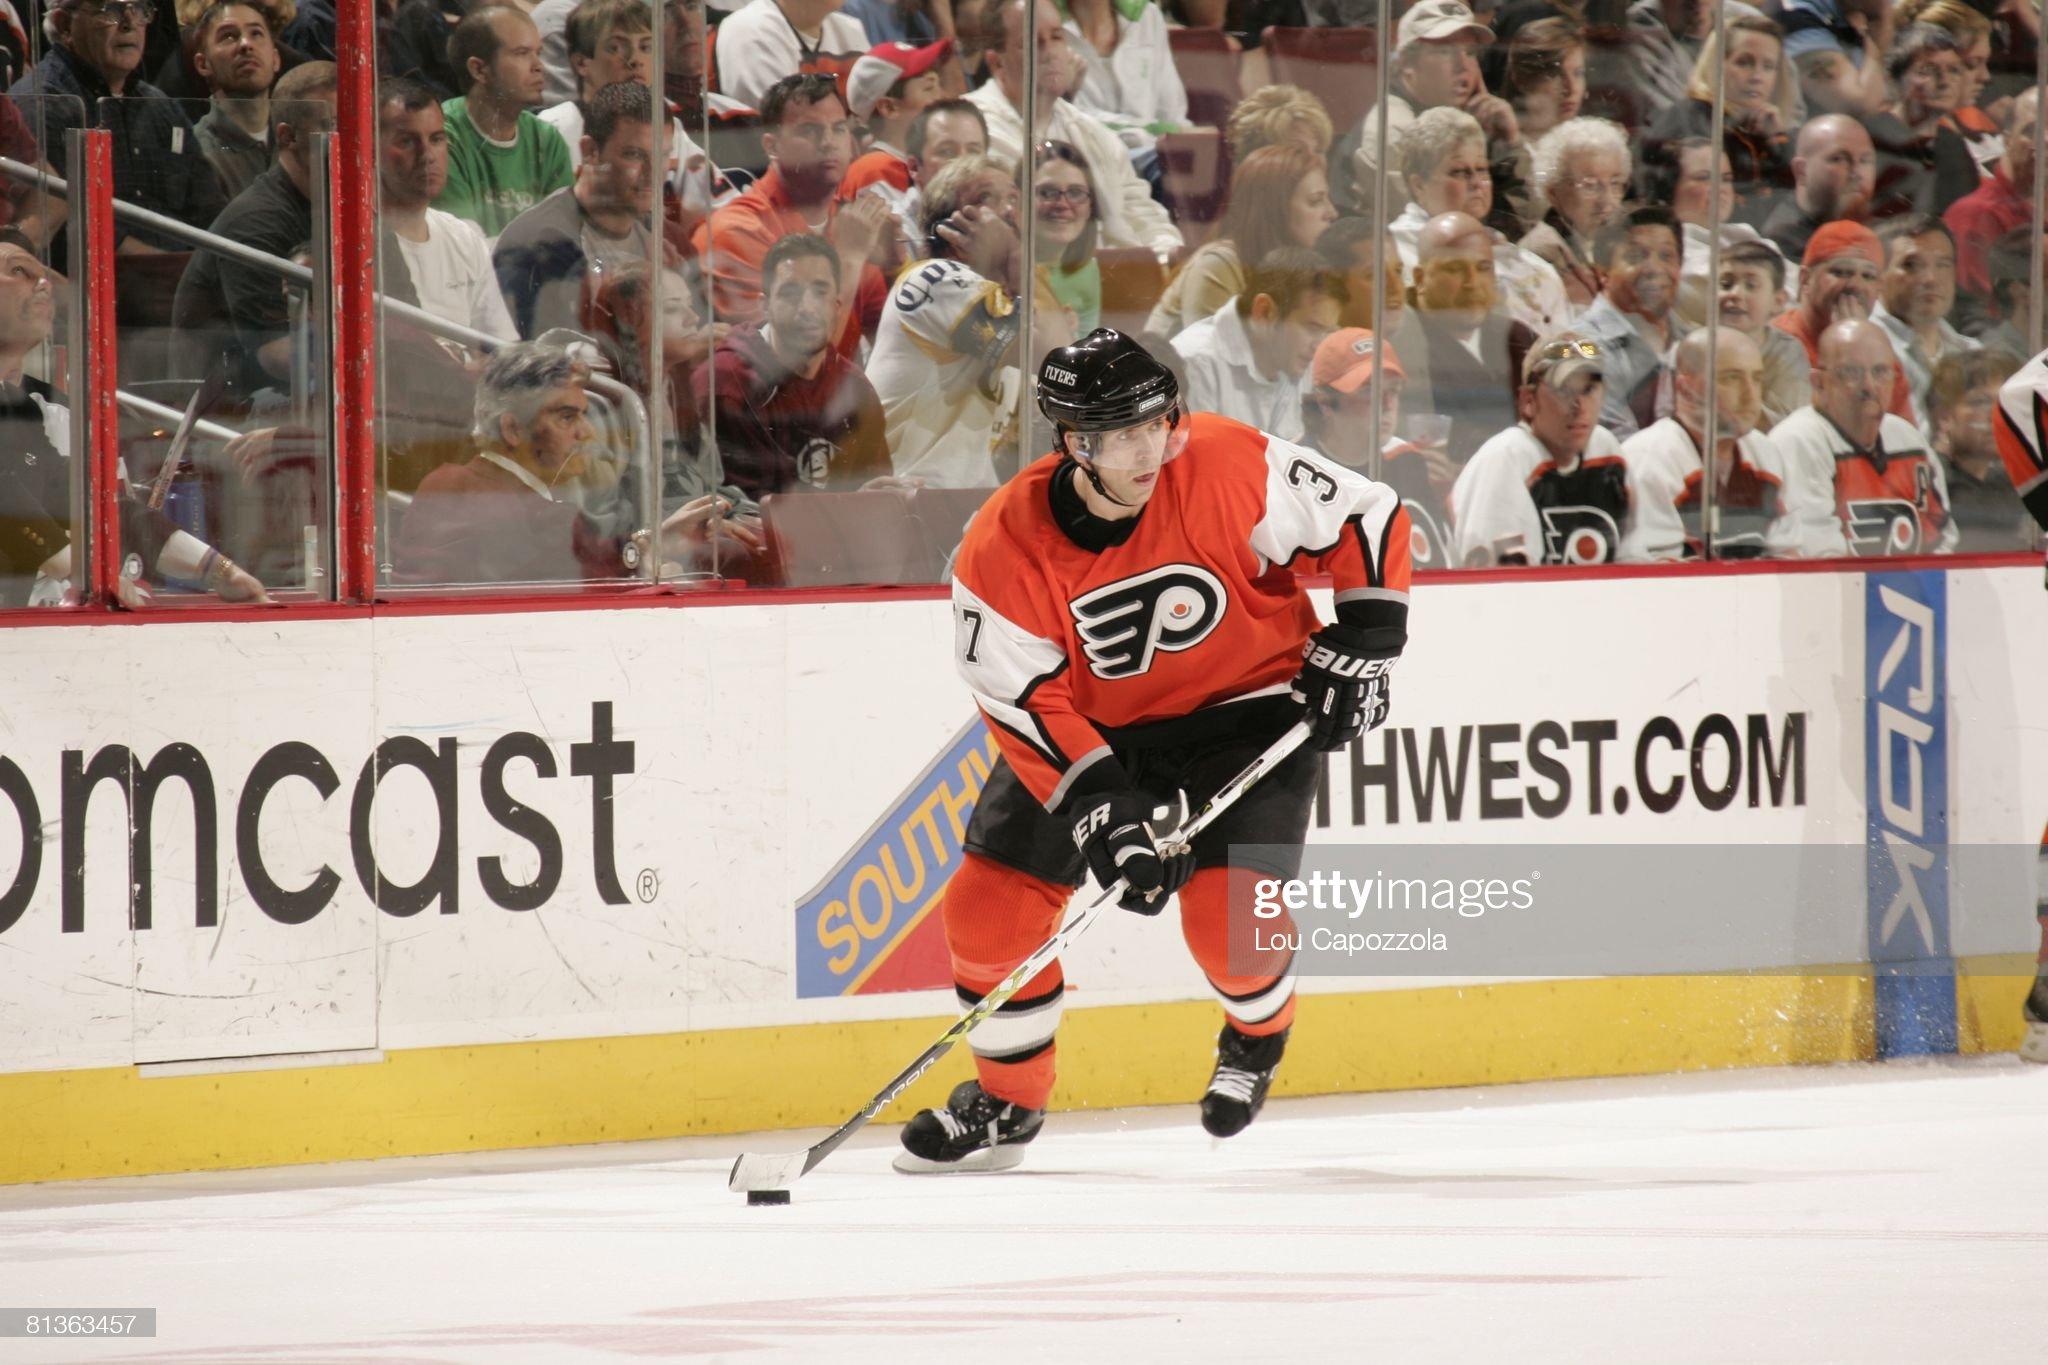 hockey-philadelphia-flyers-eric-desjardi